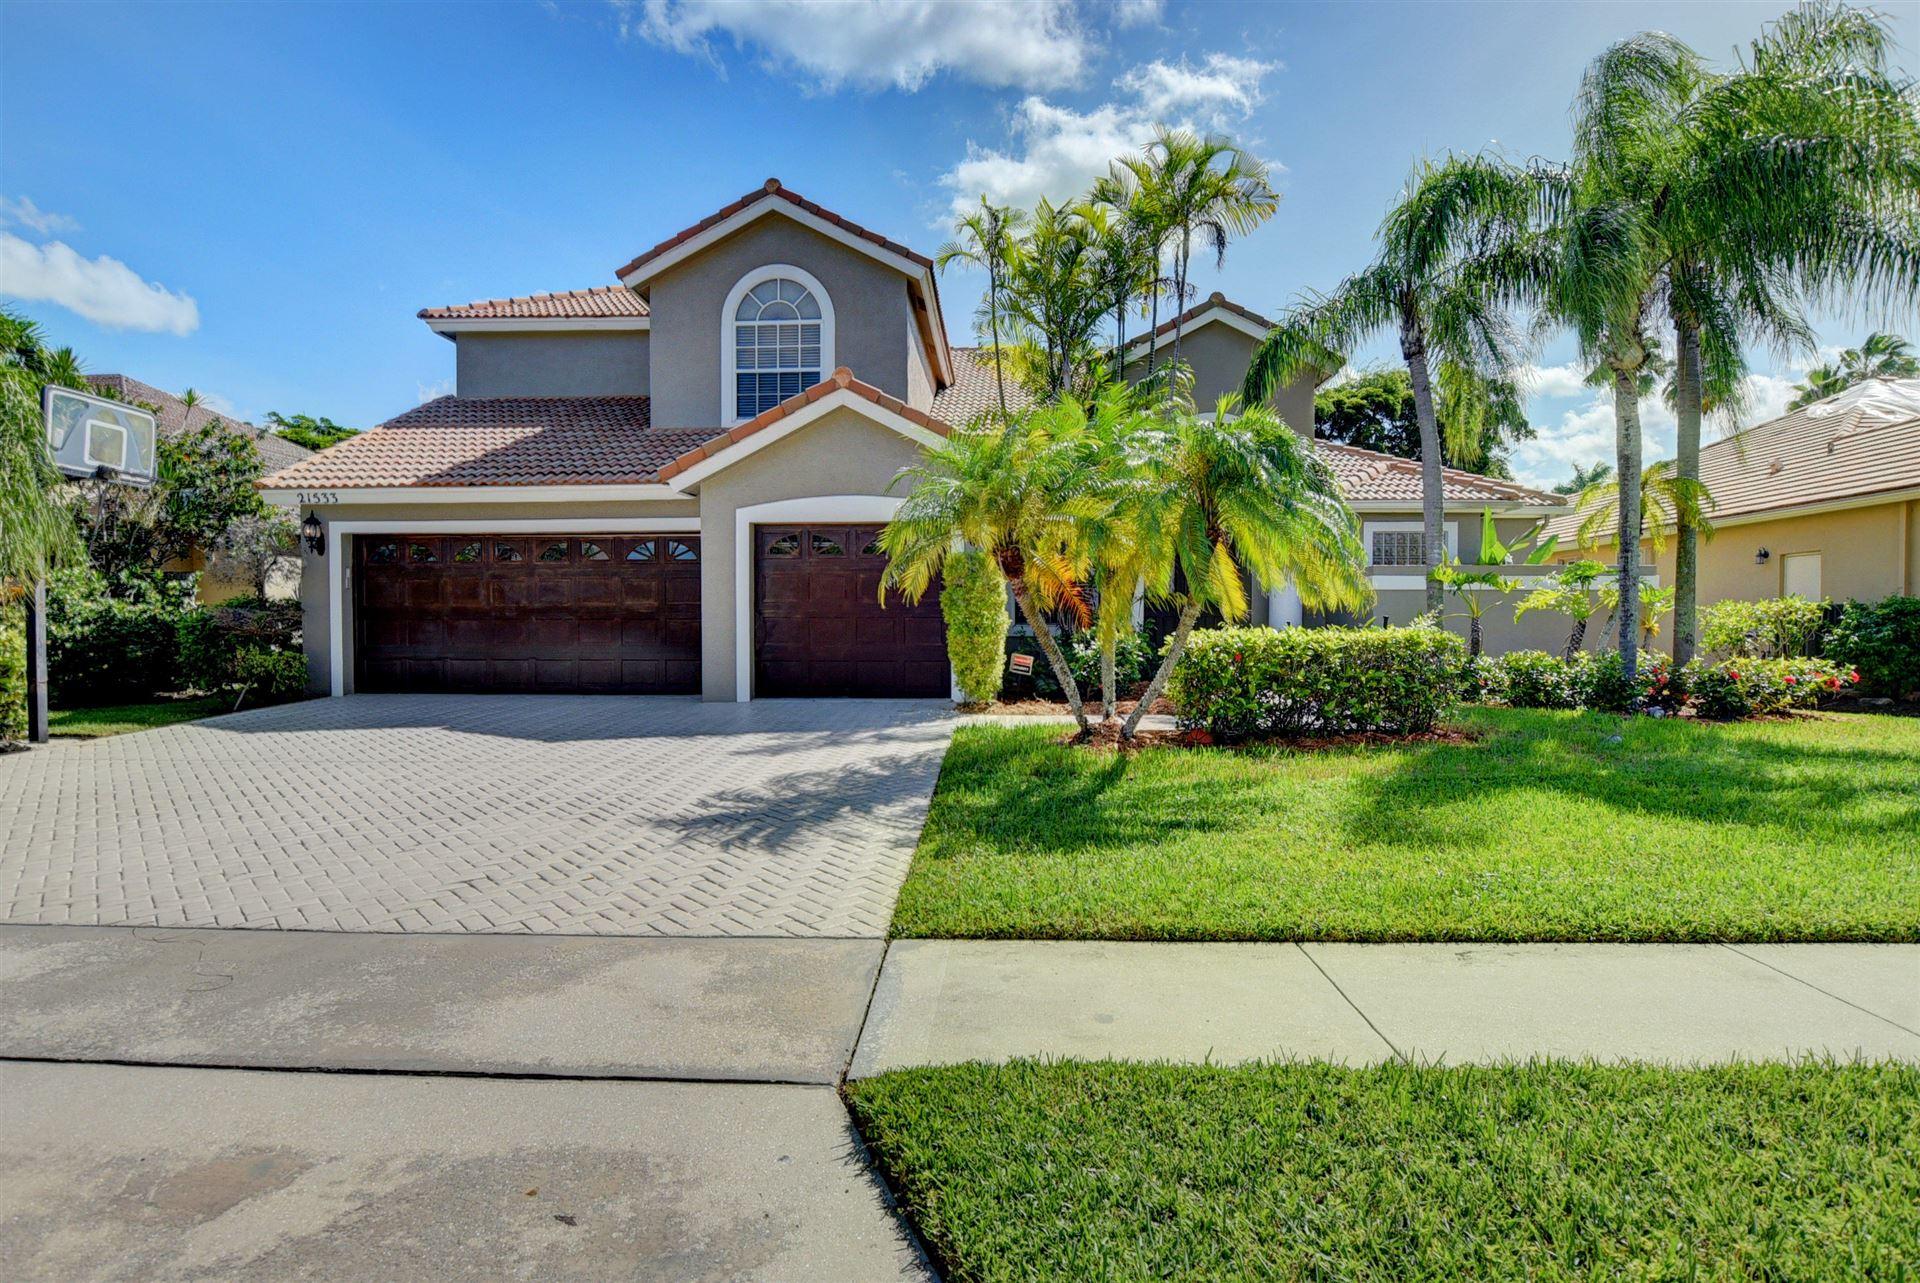 21533 Halstead Drive, Boca Raton, FL 33428 - #: RX-10656820